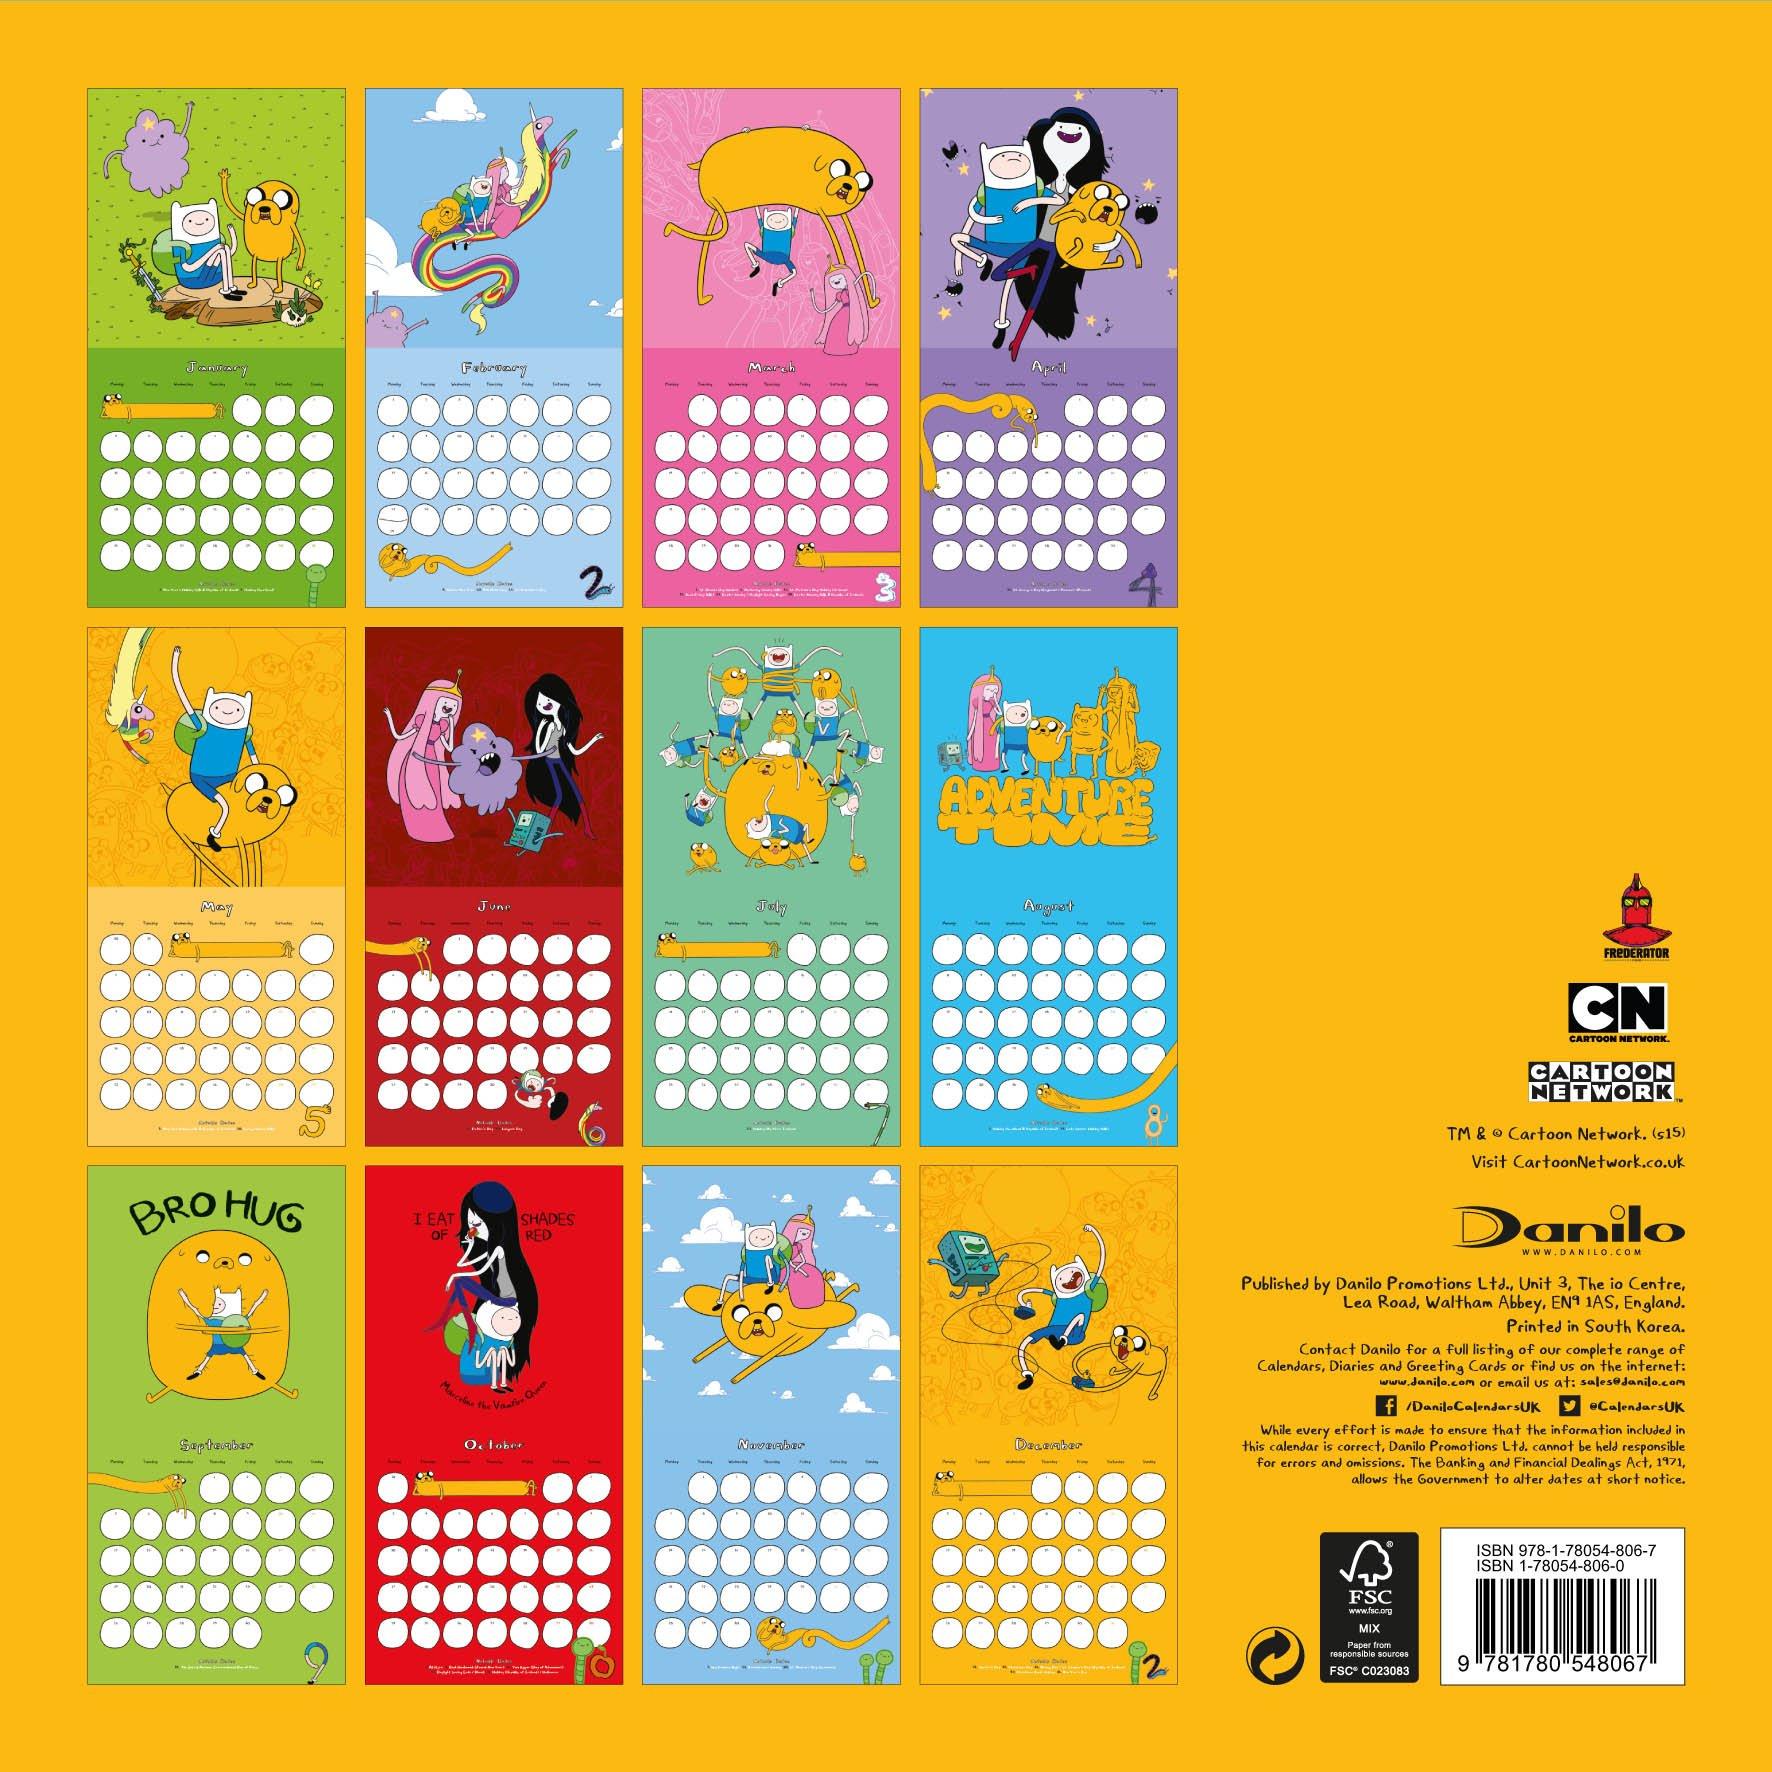 The Official Adventure Time 2016 Square Calendar: 9781780548067 ...